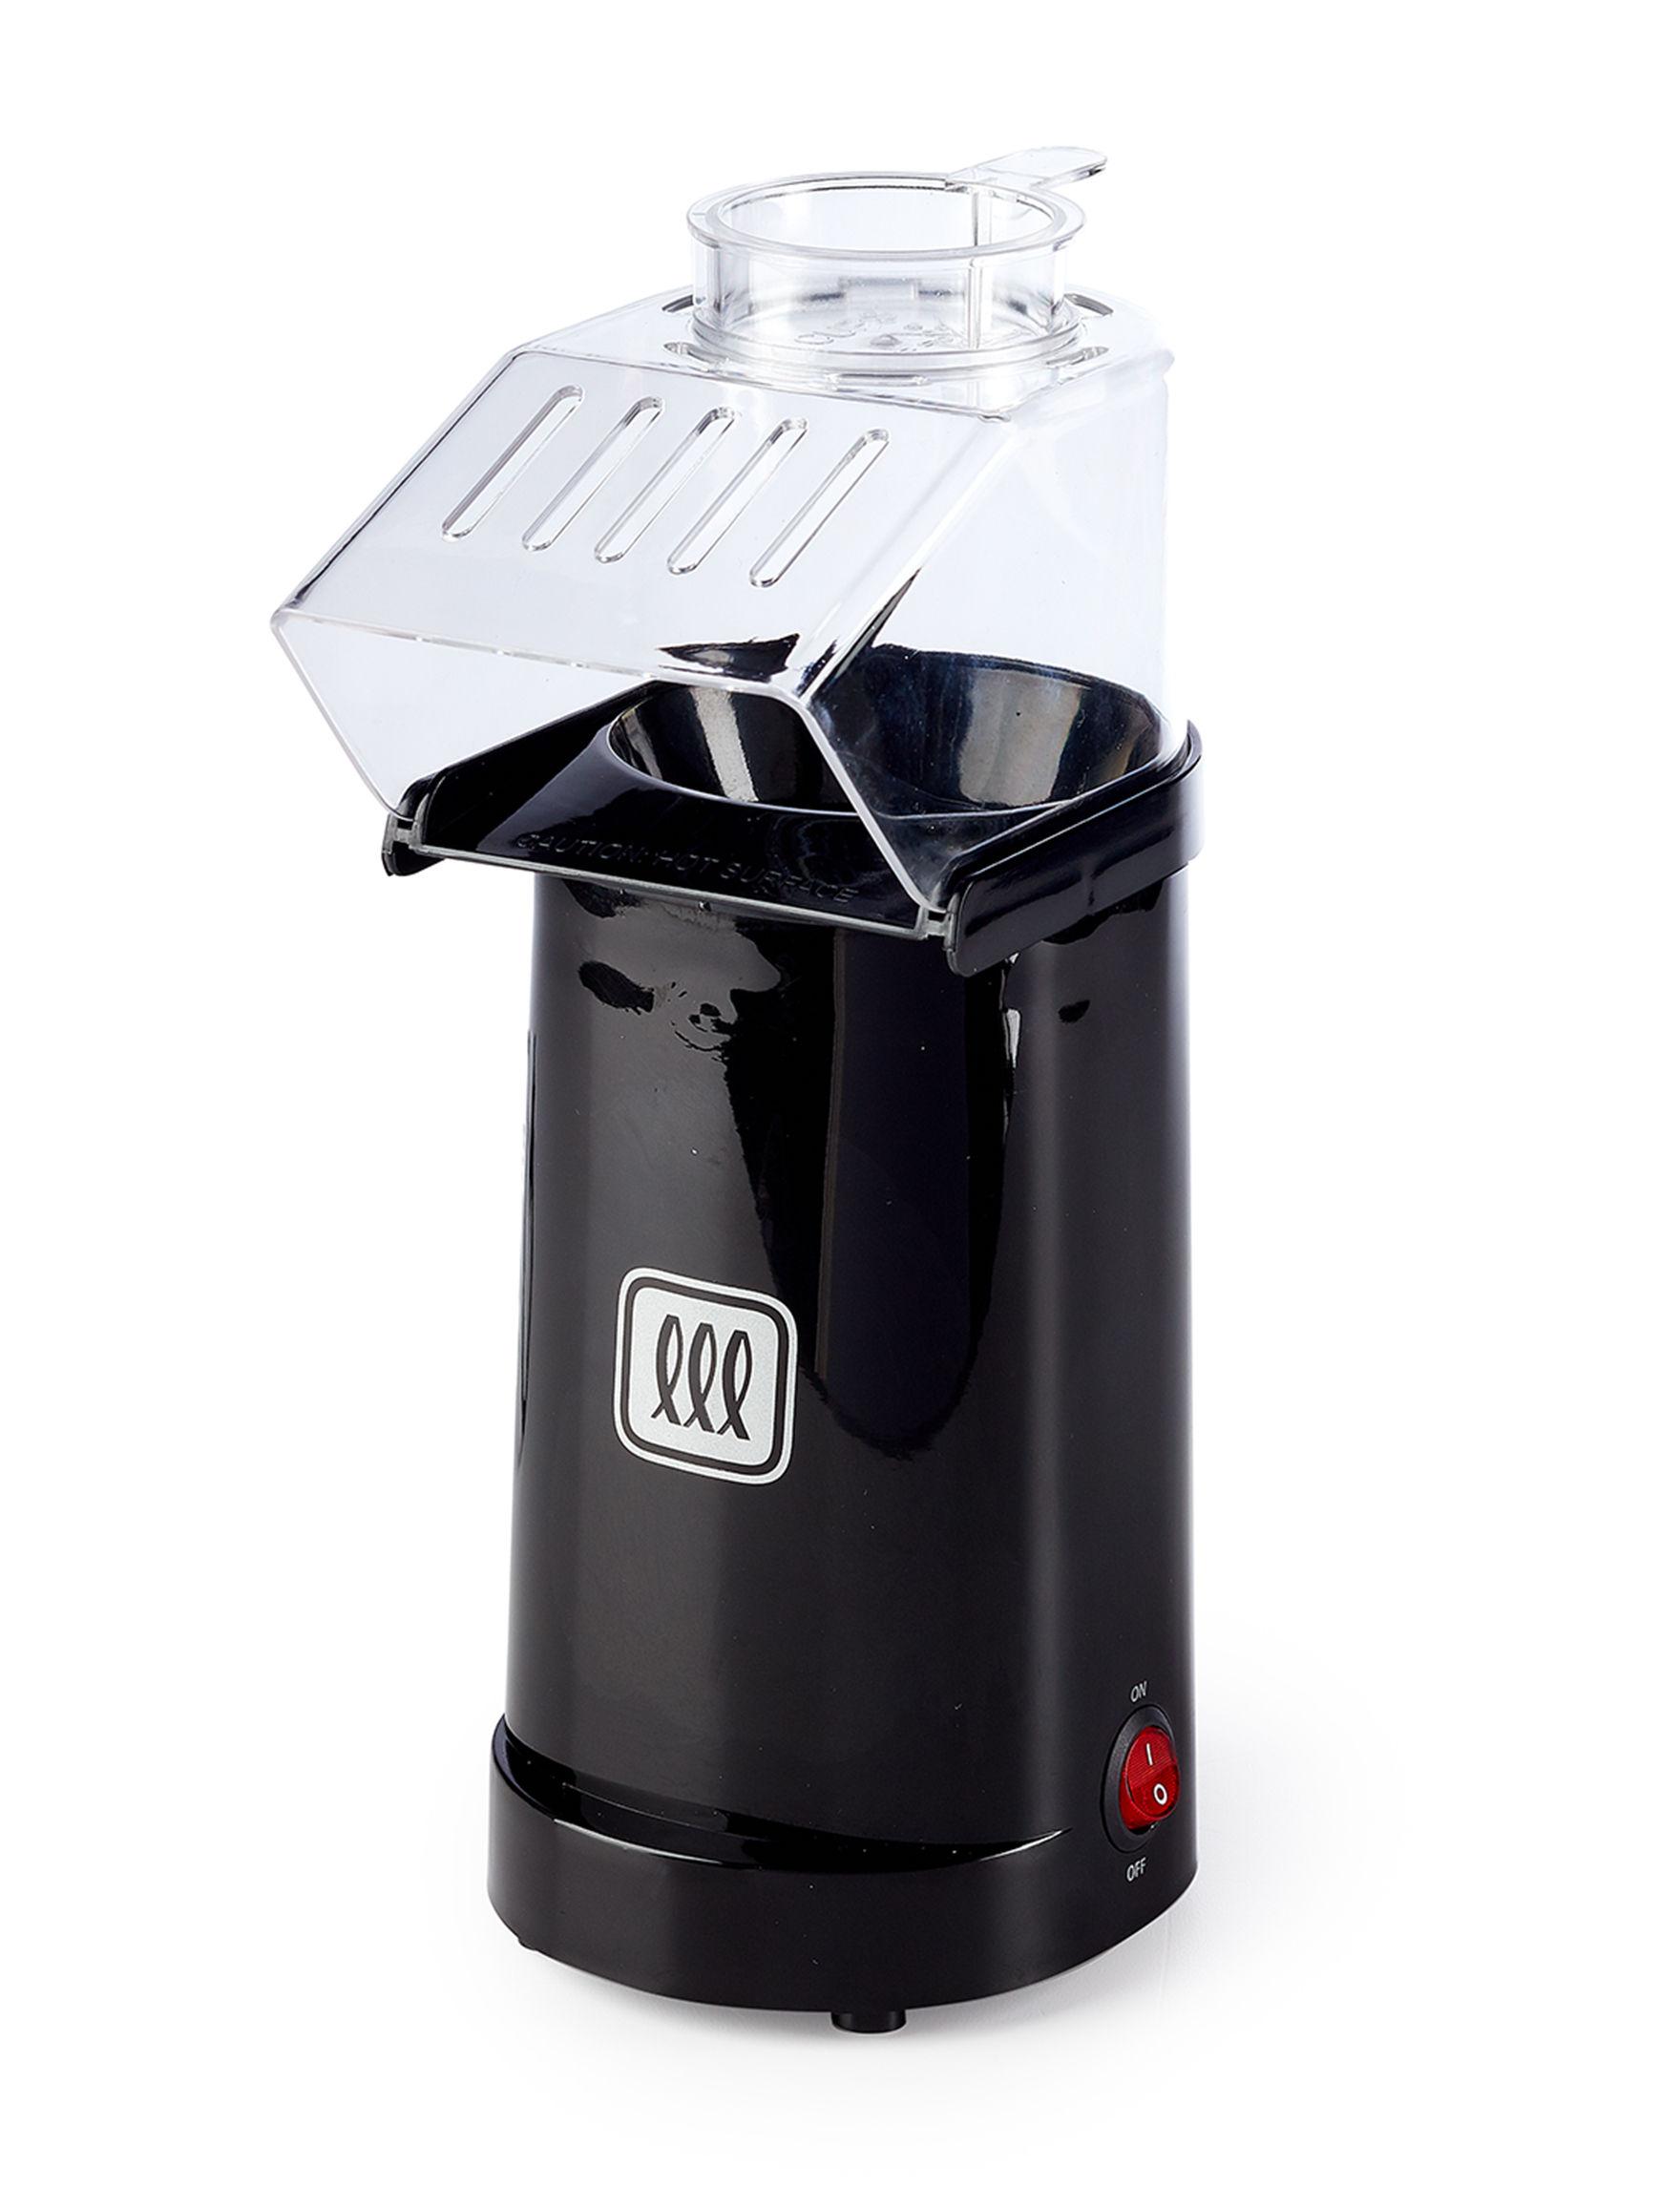 Toastmaster Black Kitchen Appliances